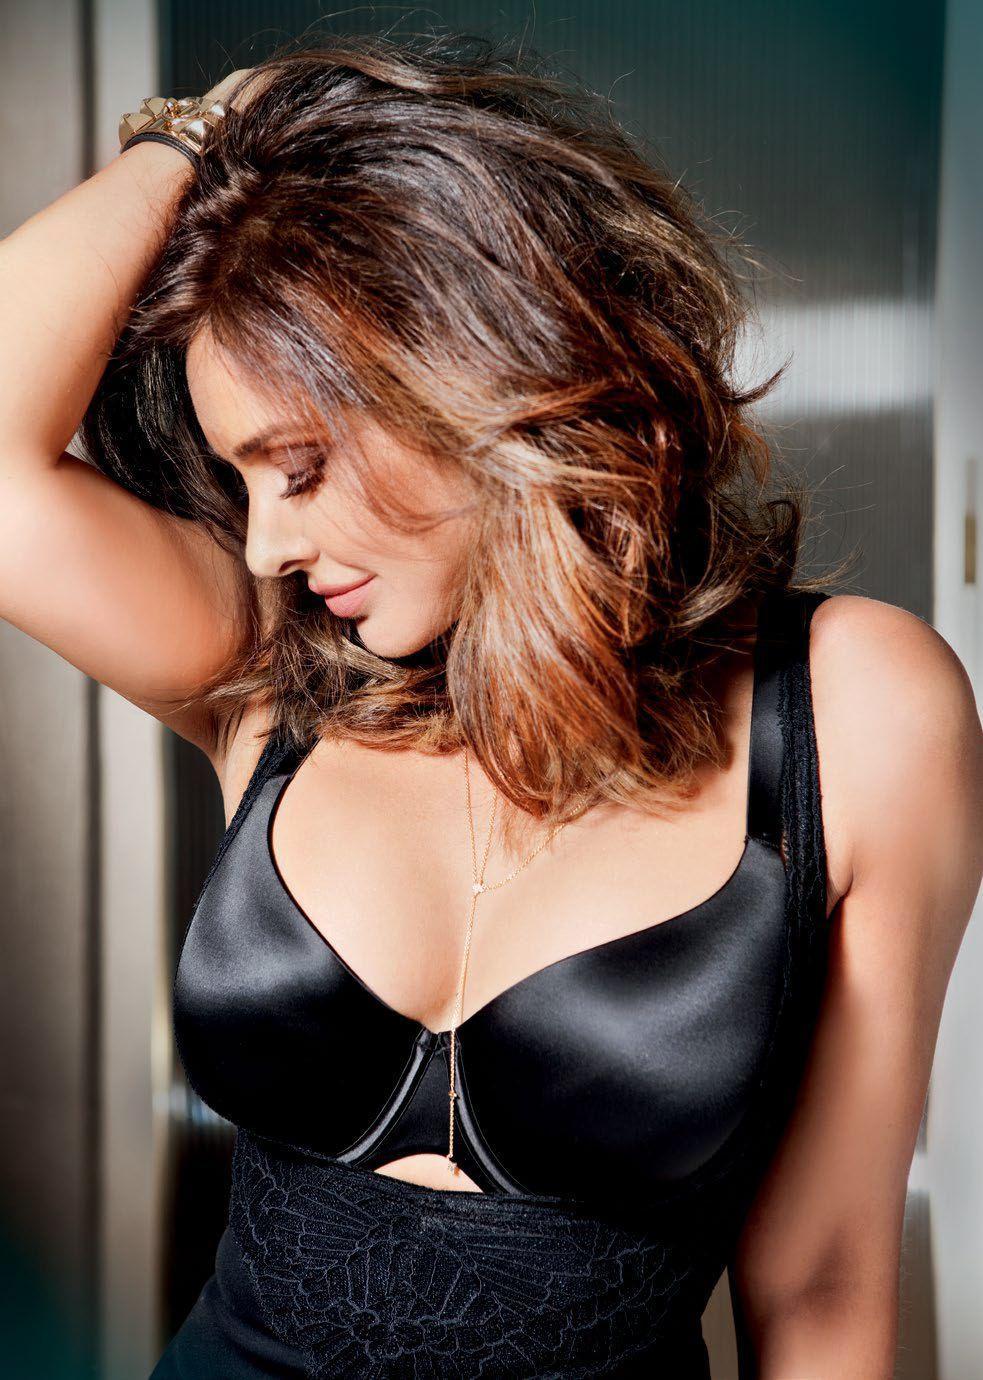 lisa ray cleavage pics